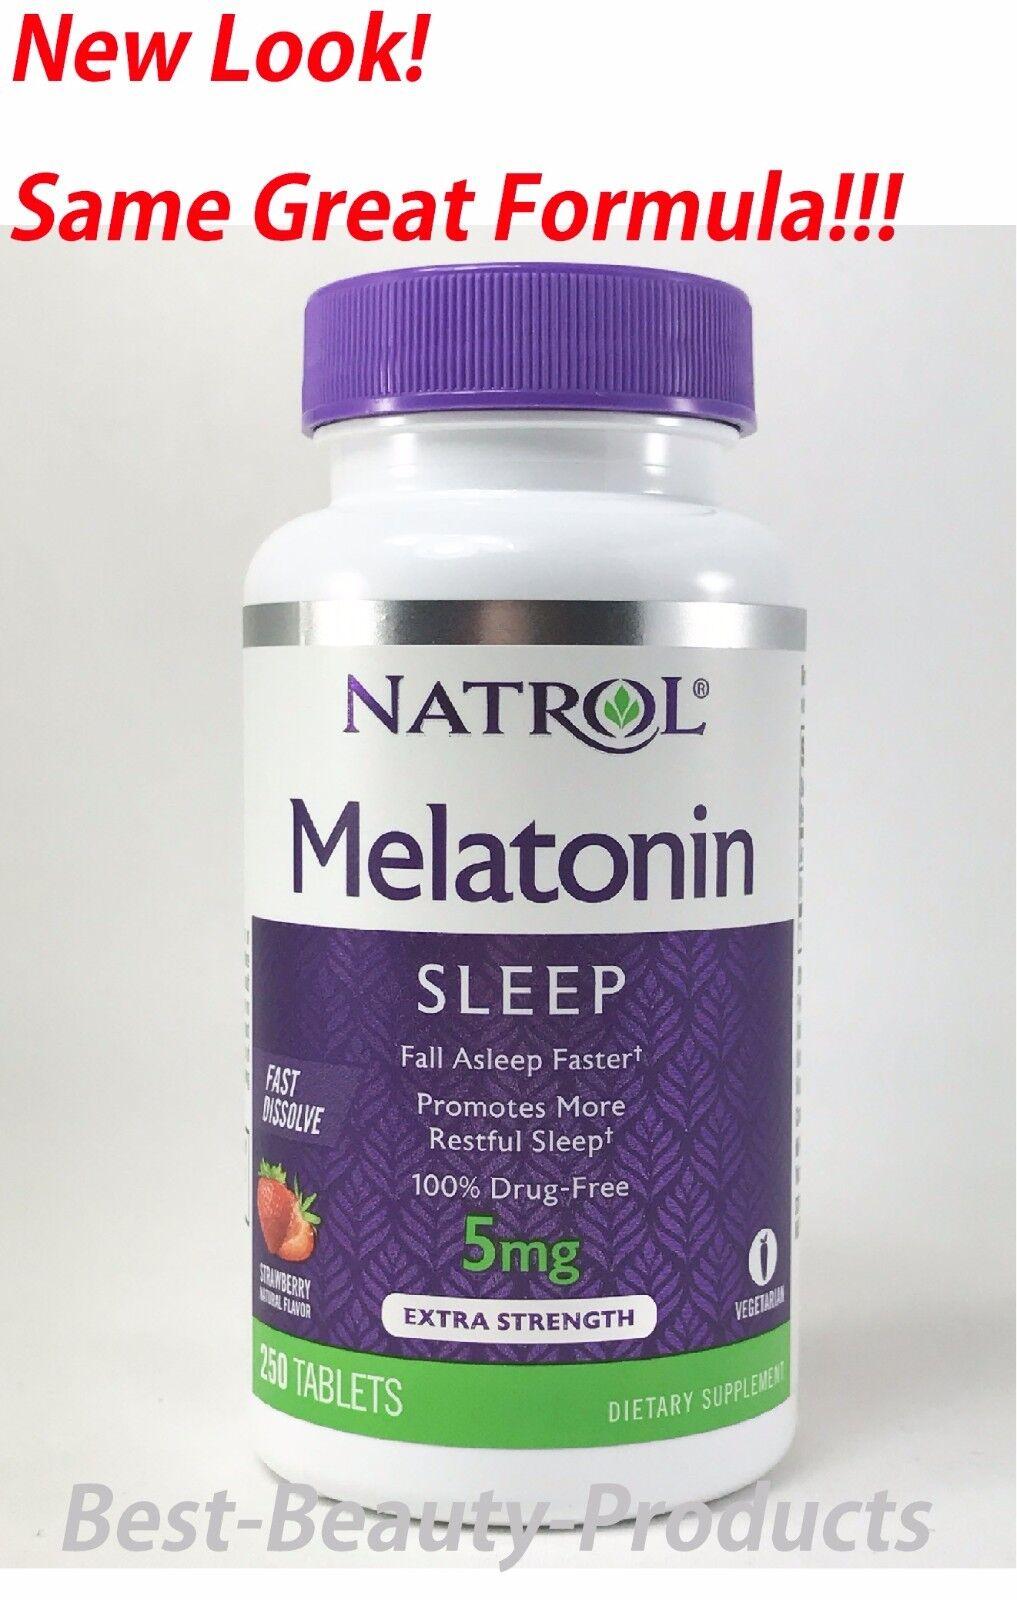 Natrol Melatonin 5 mg Fast Dissolve 250 Tablets - Strawberry Flavor